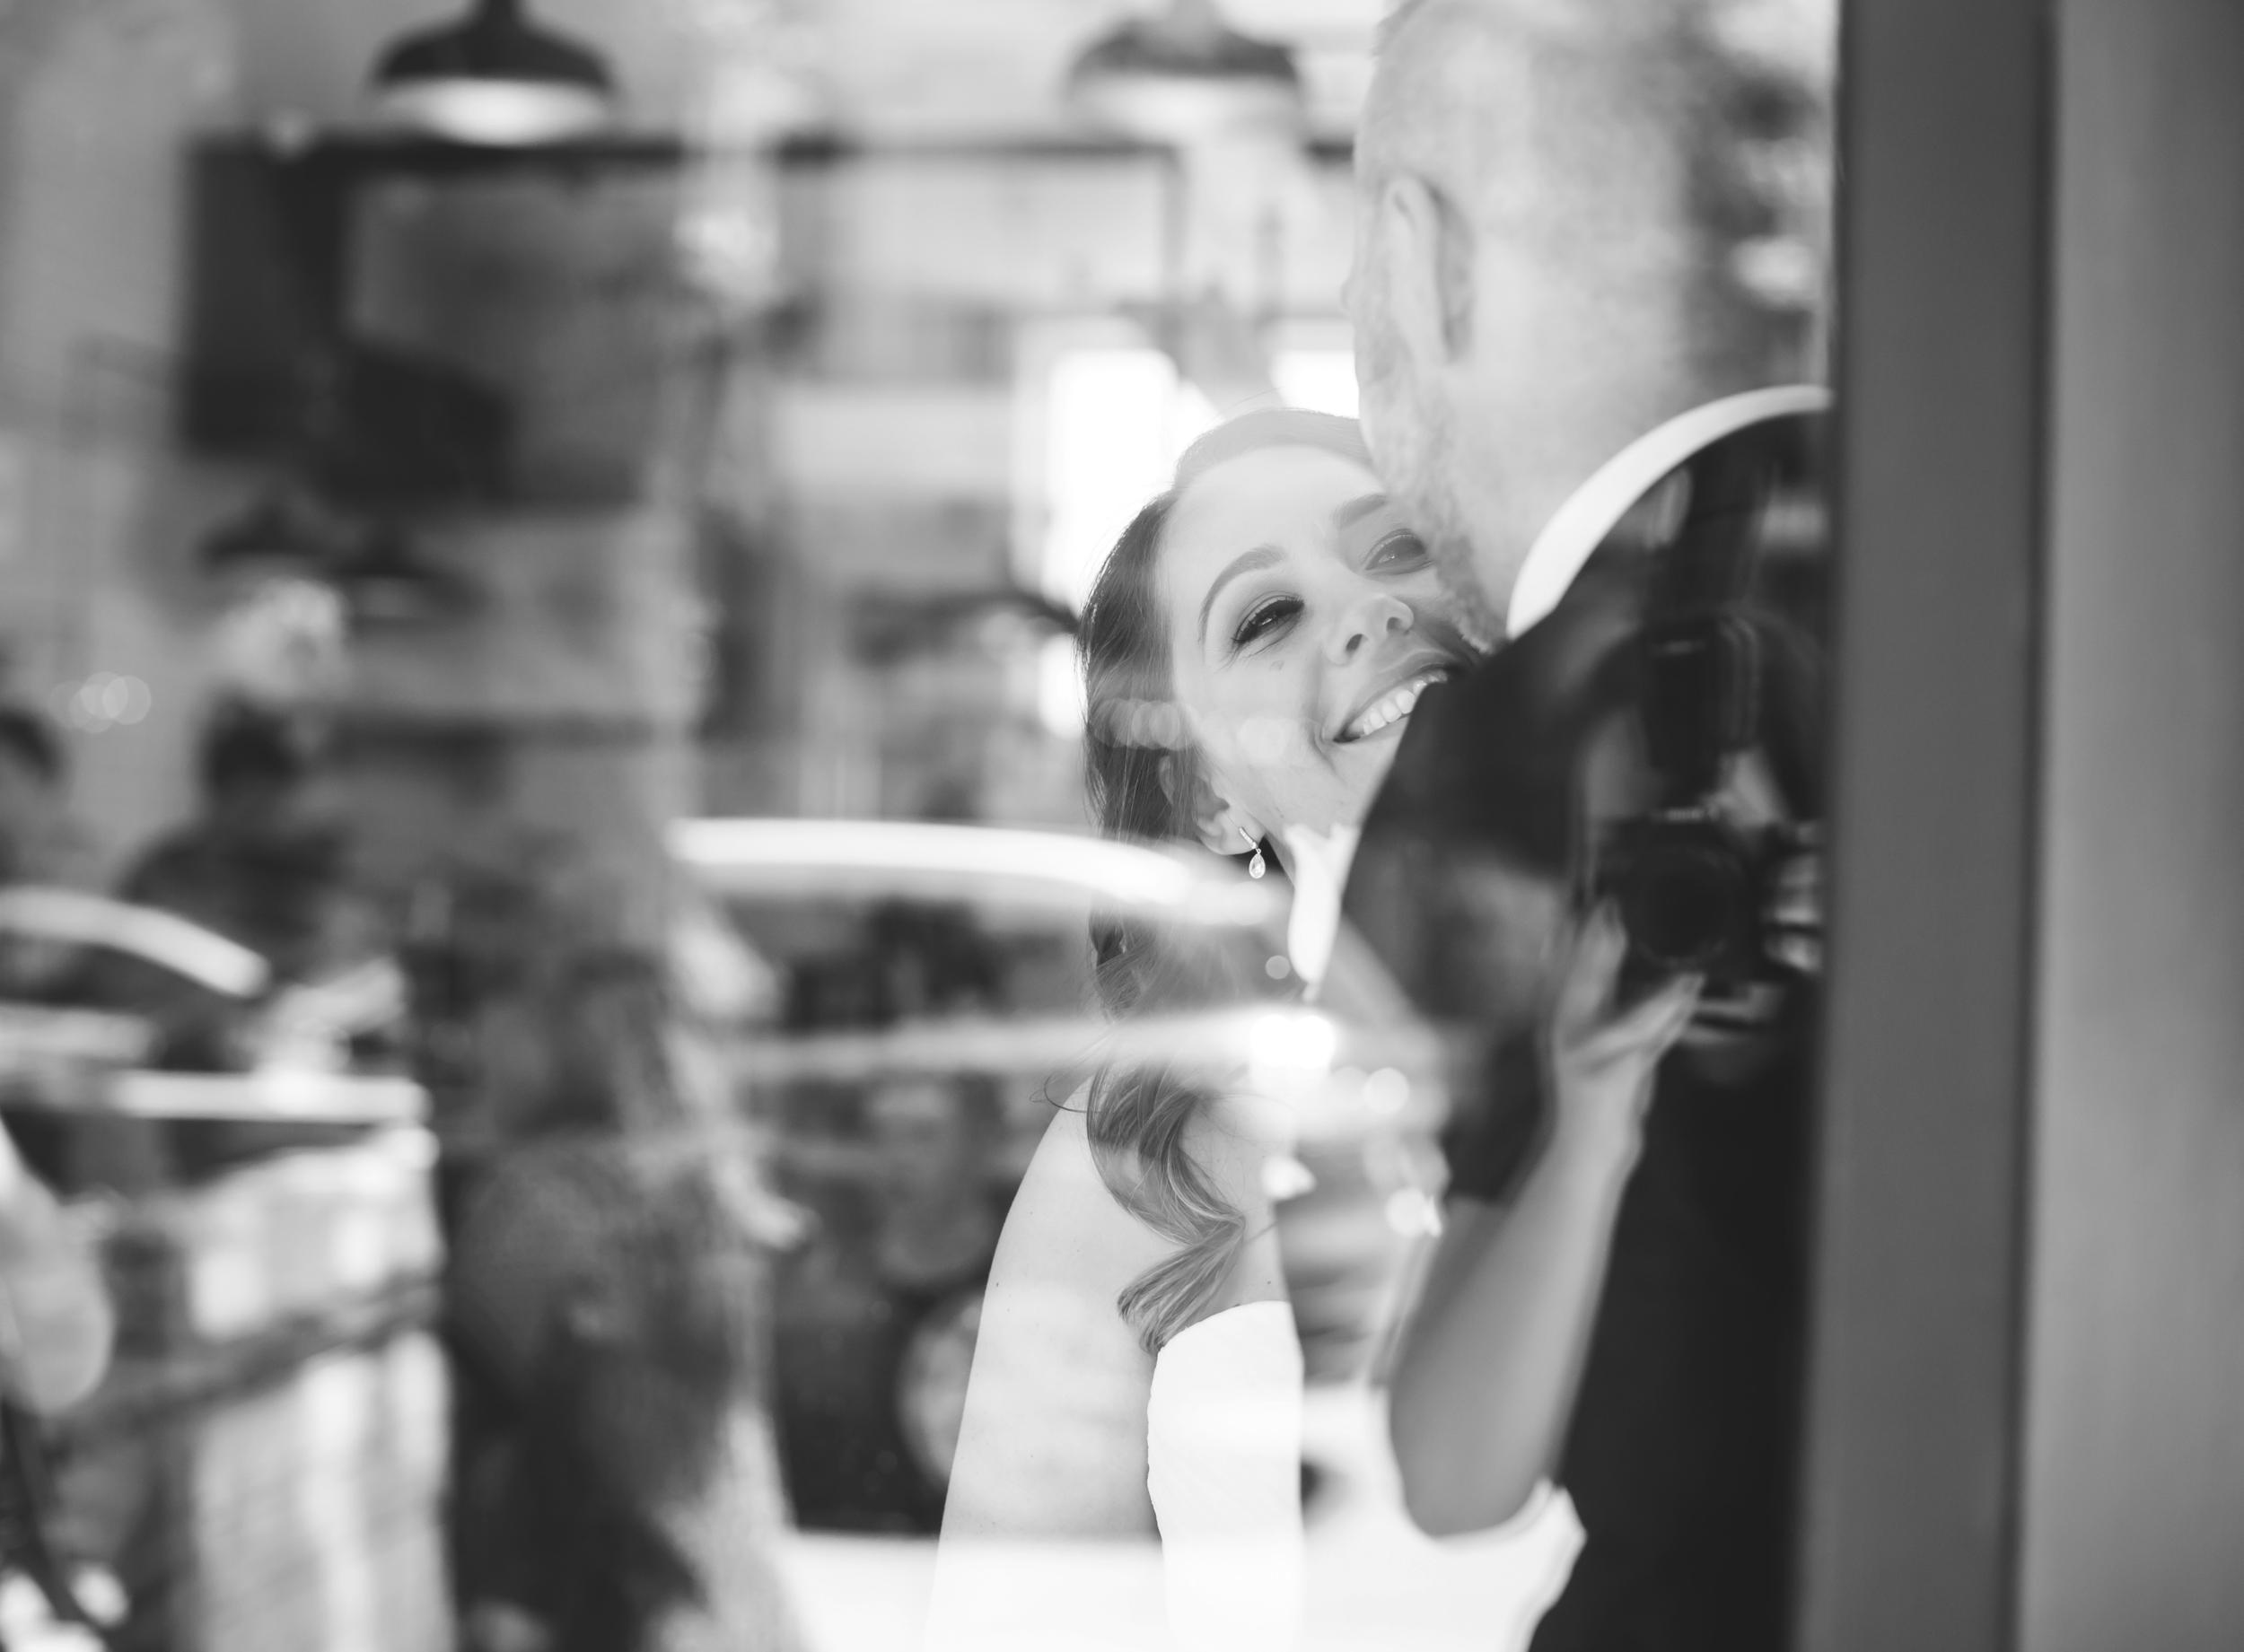 Wedding-Harbour-Banquet-Center-Oakville-Photographer-Wedding-Hamilton-Saint-James-Espresso-Downtown-HamOnt-GTA-Niagara-Toronto-Moments-by-Lauren-Photography-Photo-Image-30.png